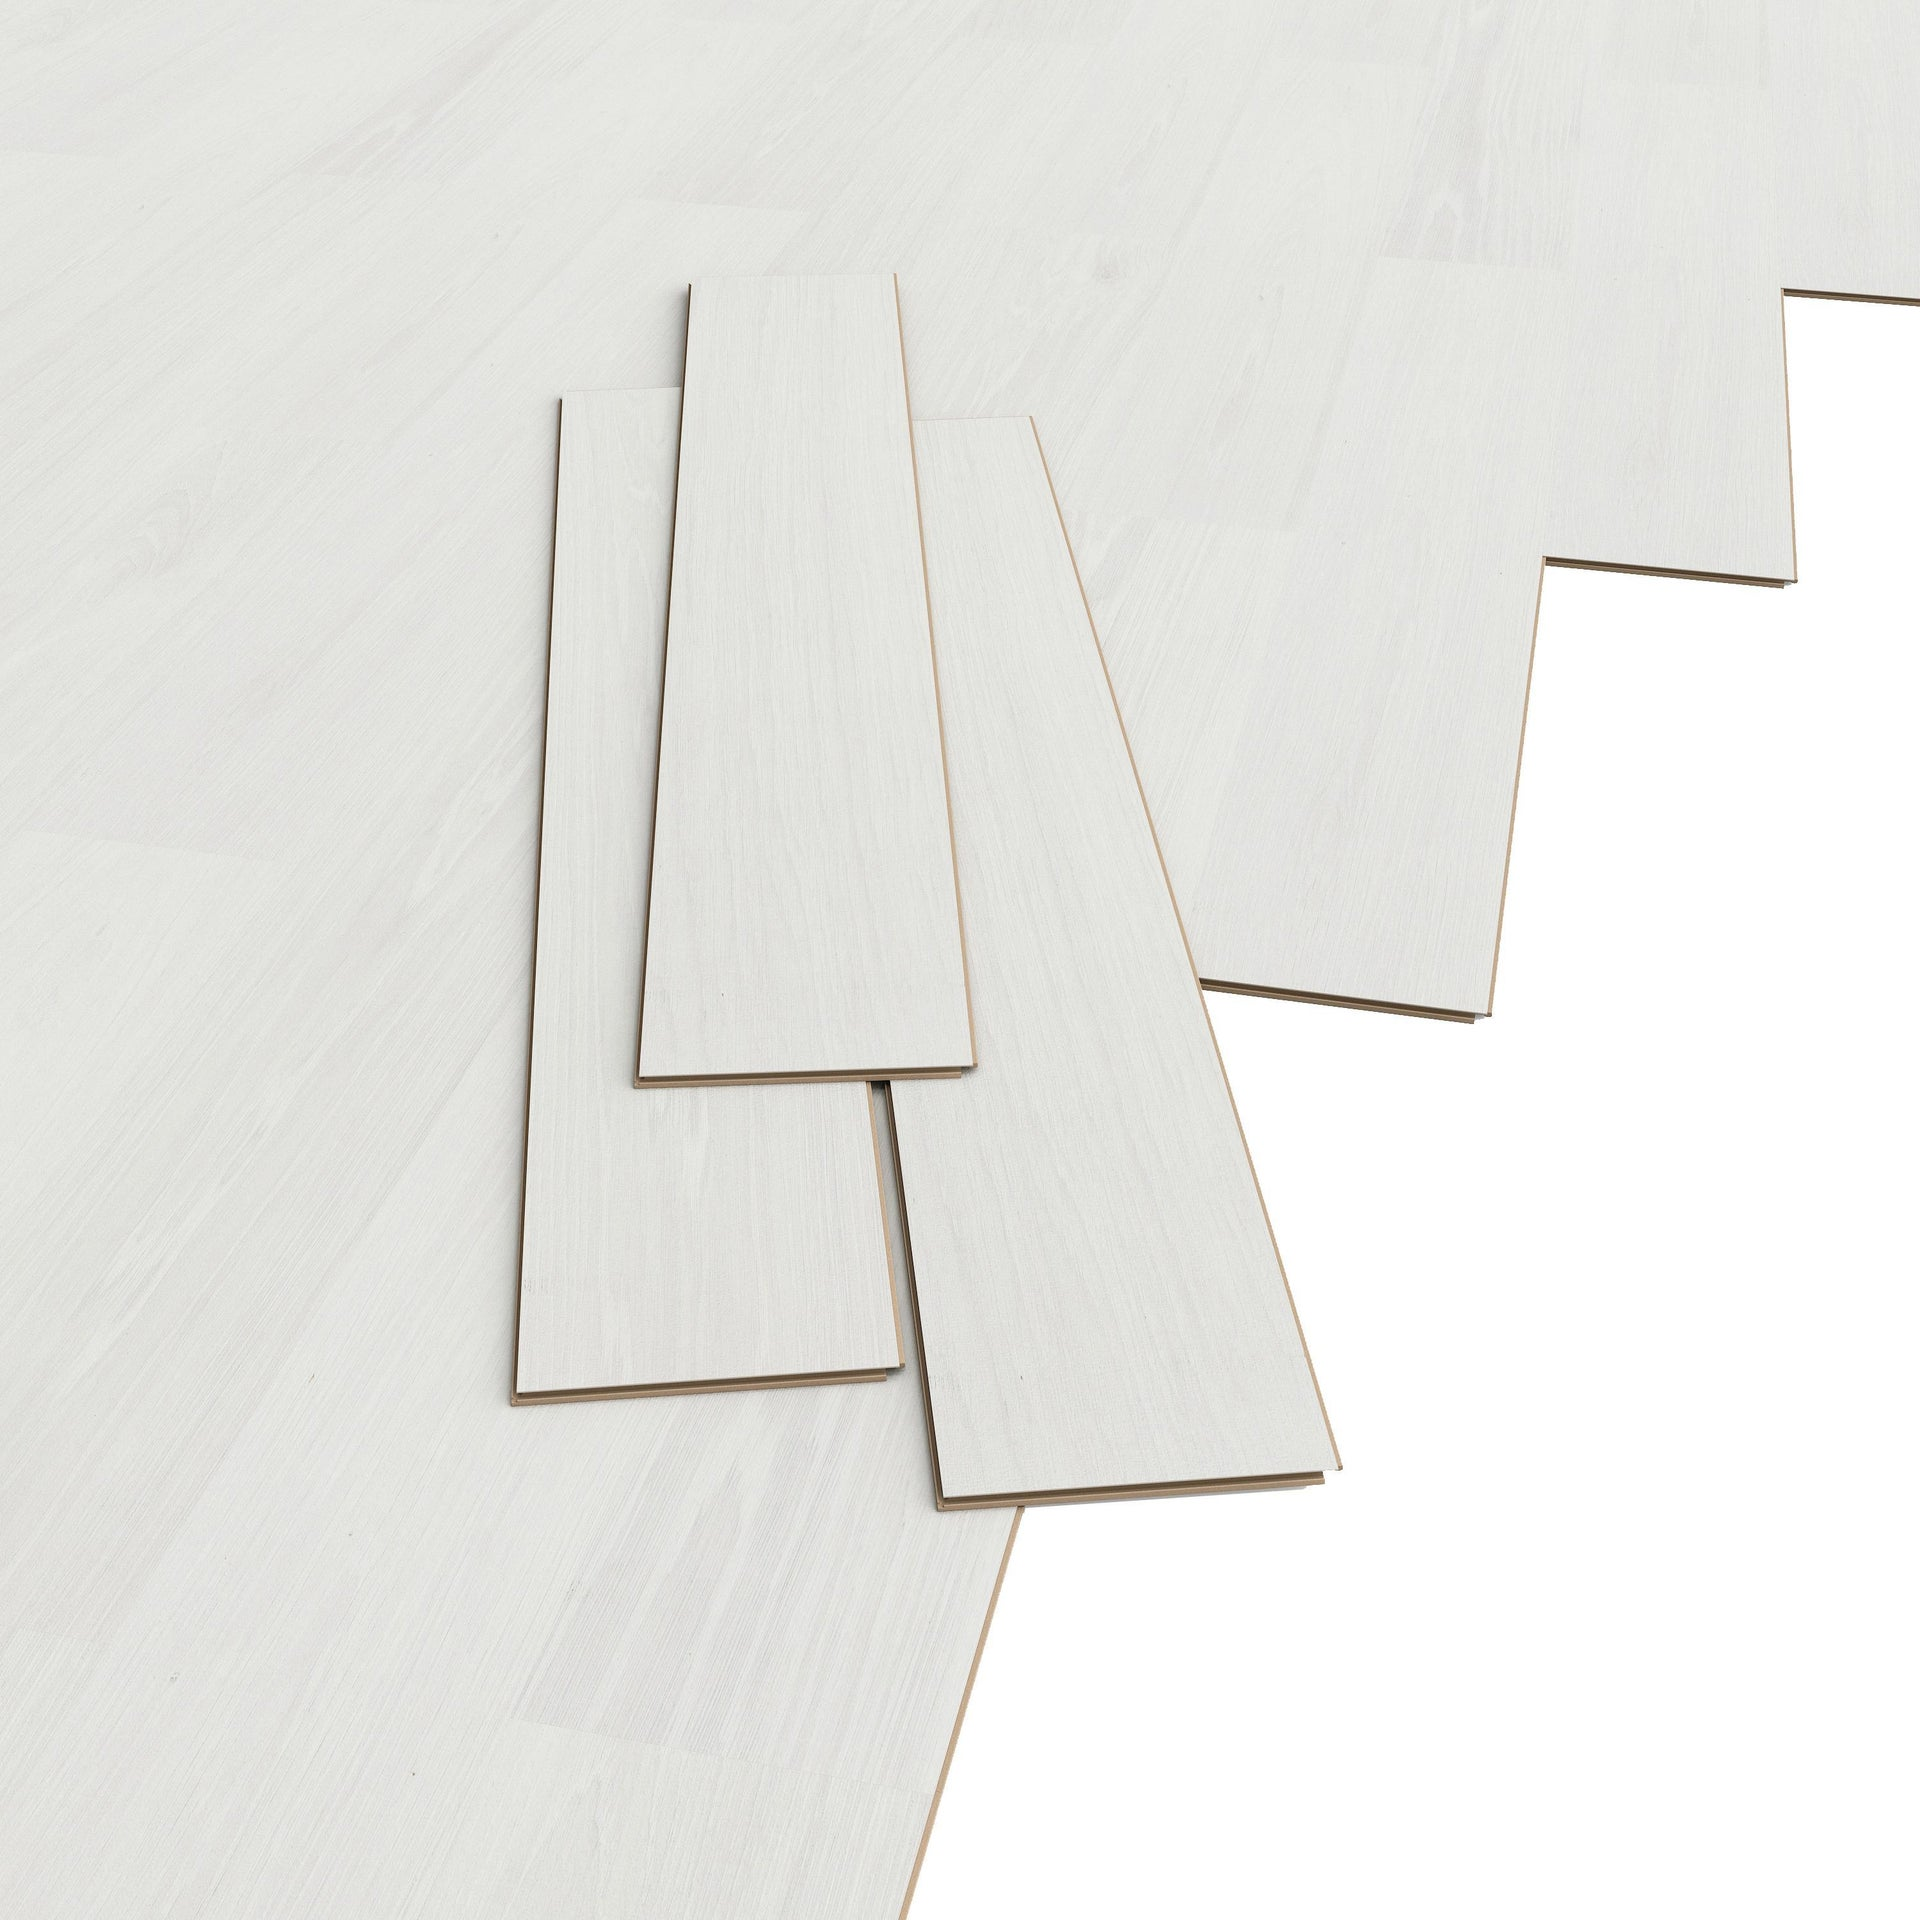 Pavimento laminato Vasa Sp 7 mm bianco - 3